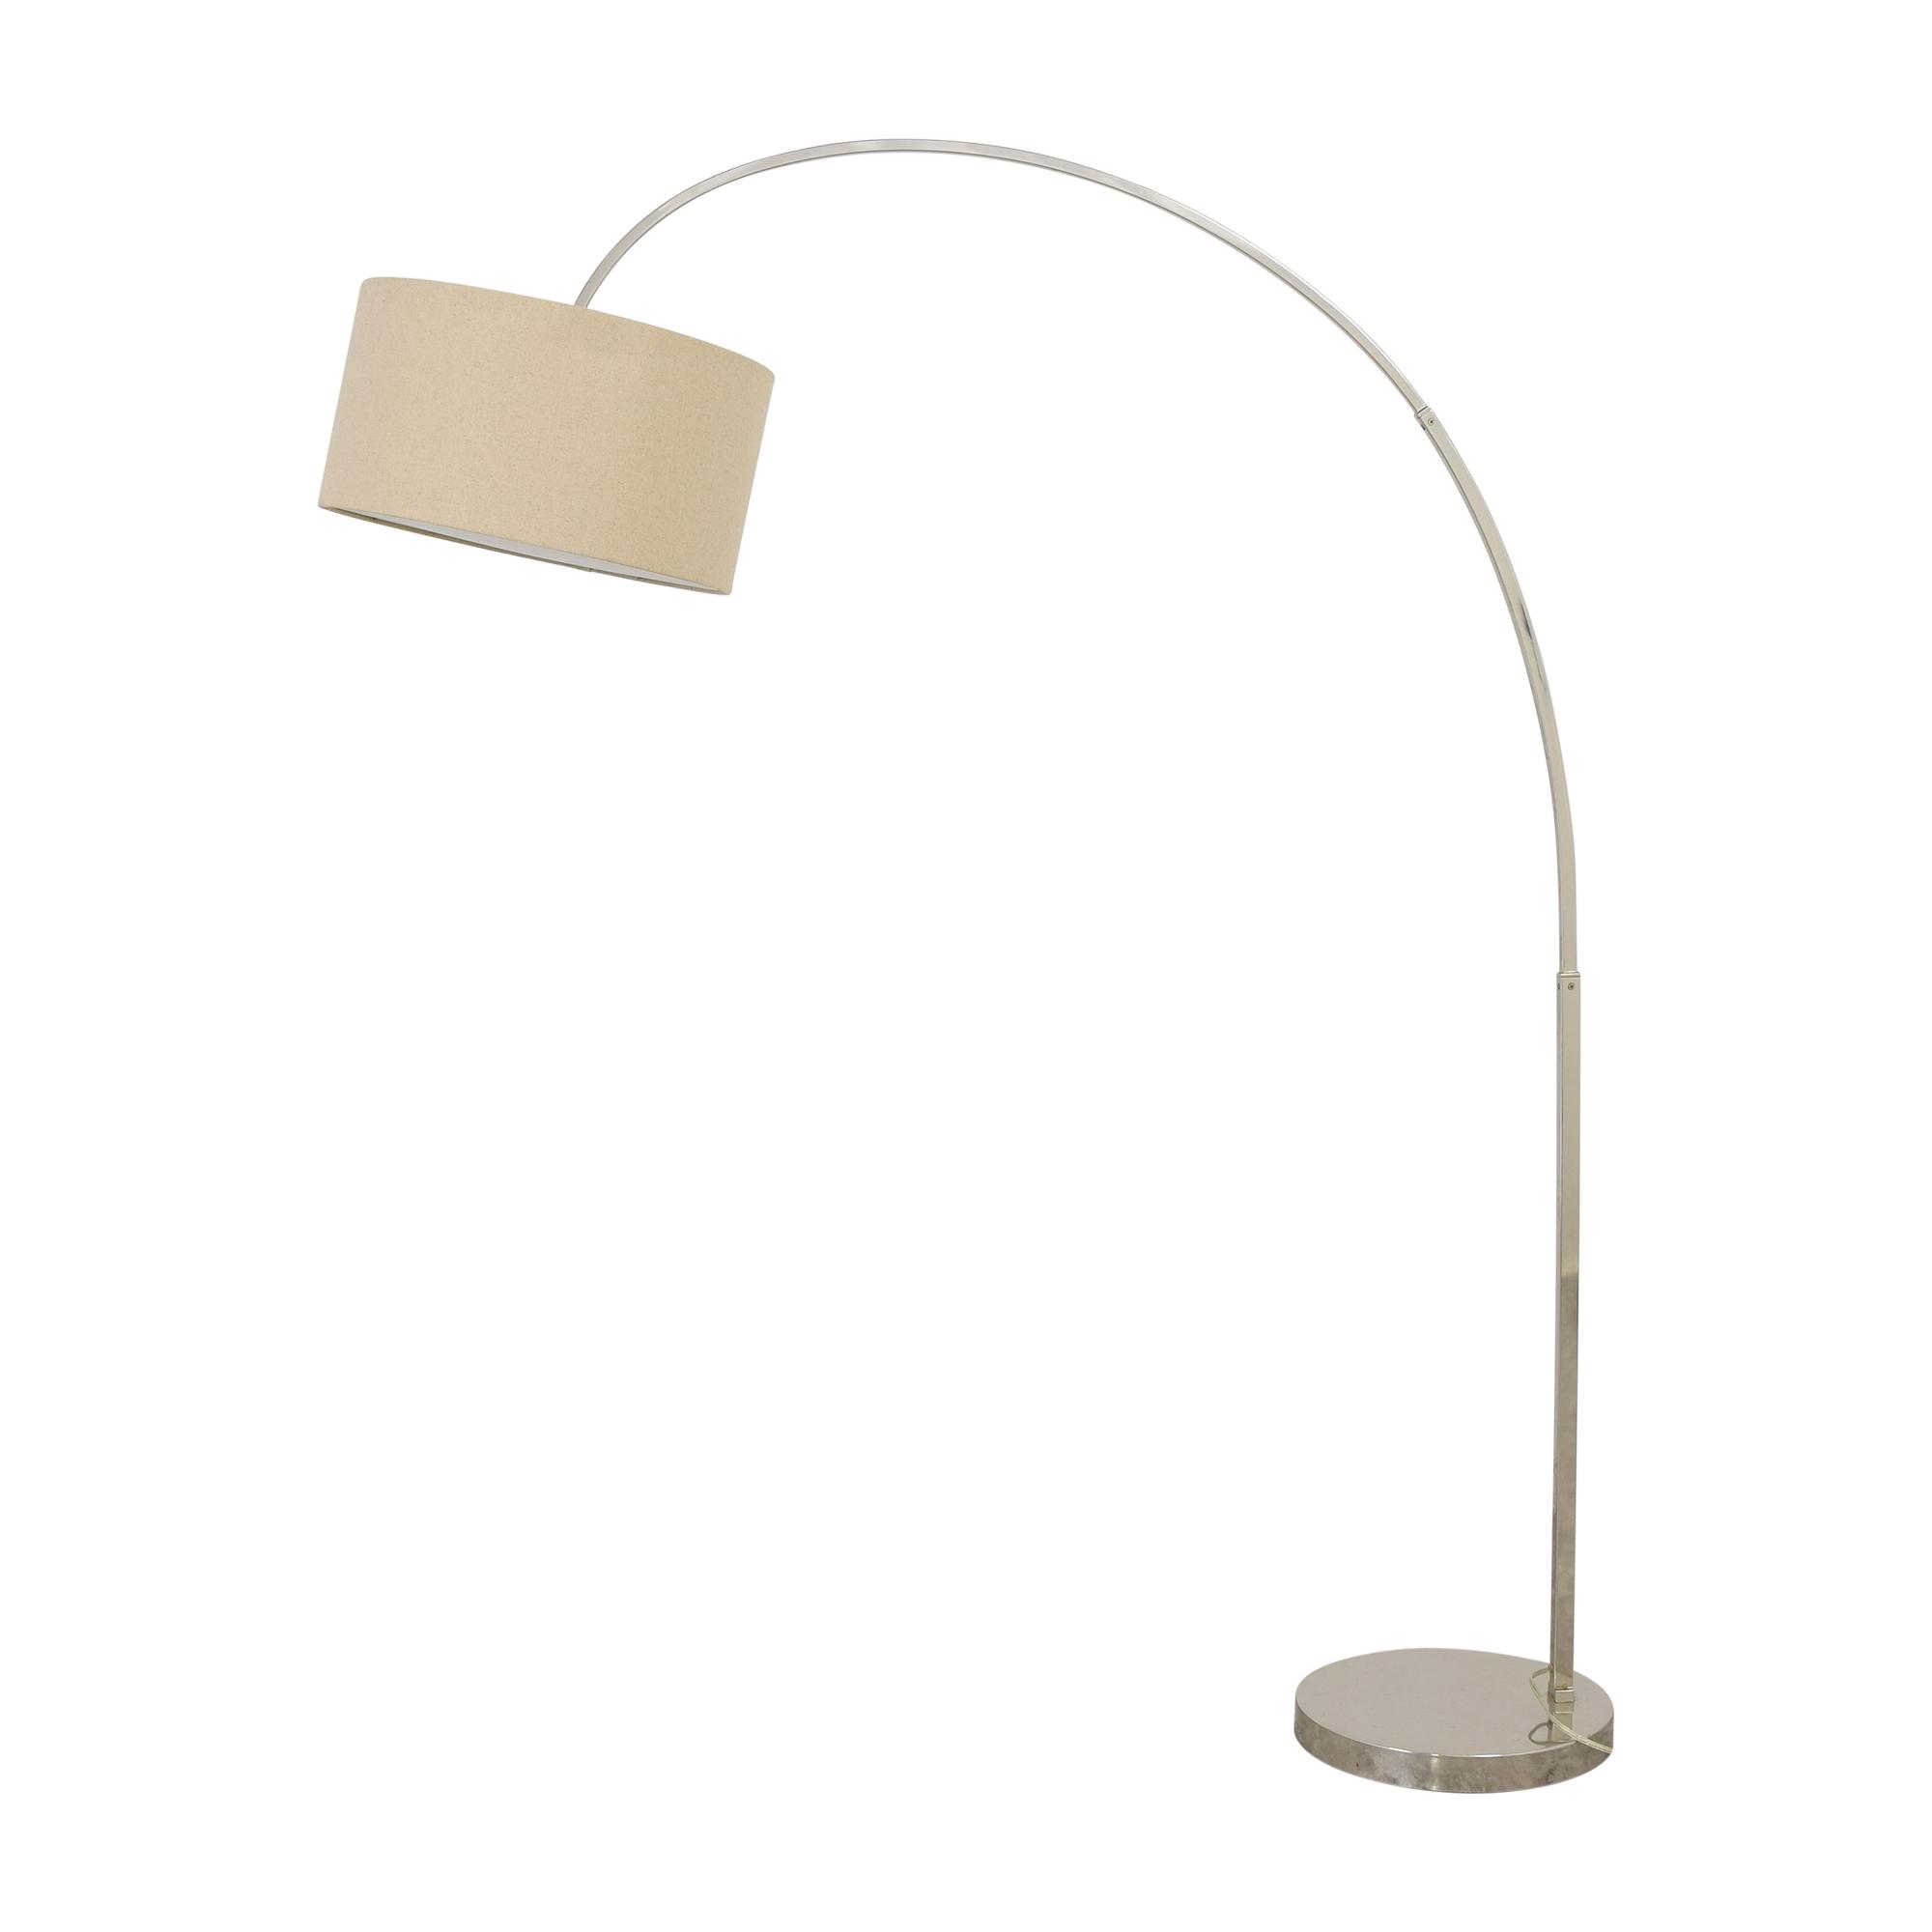 West Elm West Elm Overarching Floor Lamp used